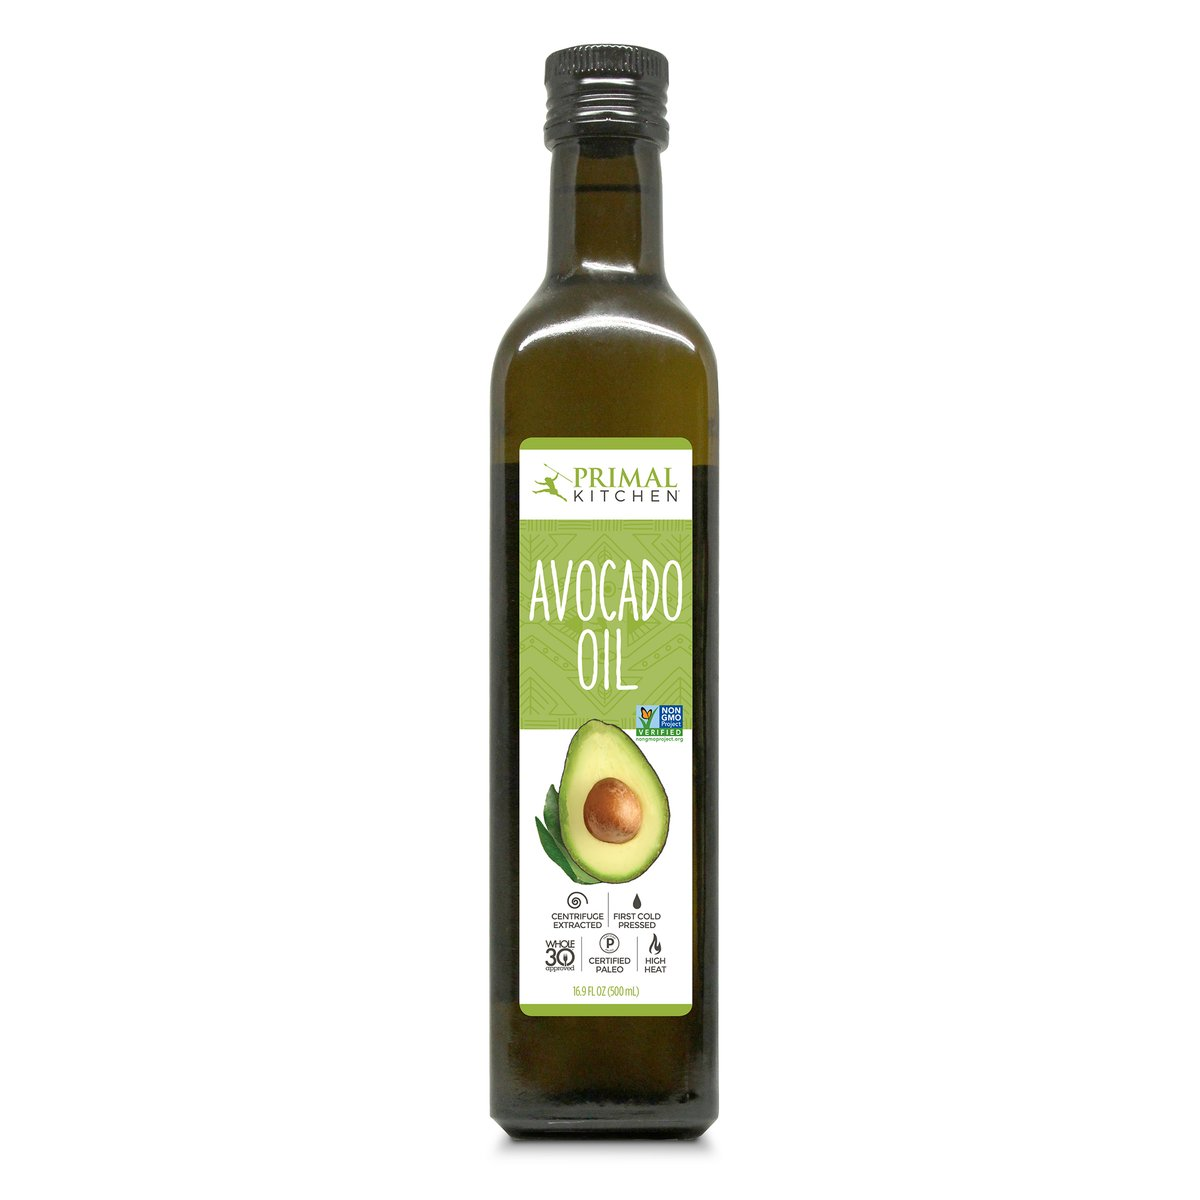 Primal Kitchen - Avocado Oil   Use Code: KETONUTRITION for 10% off